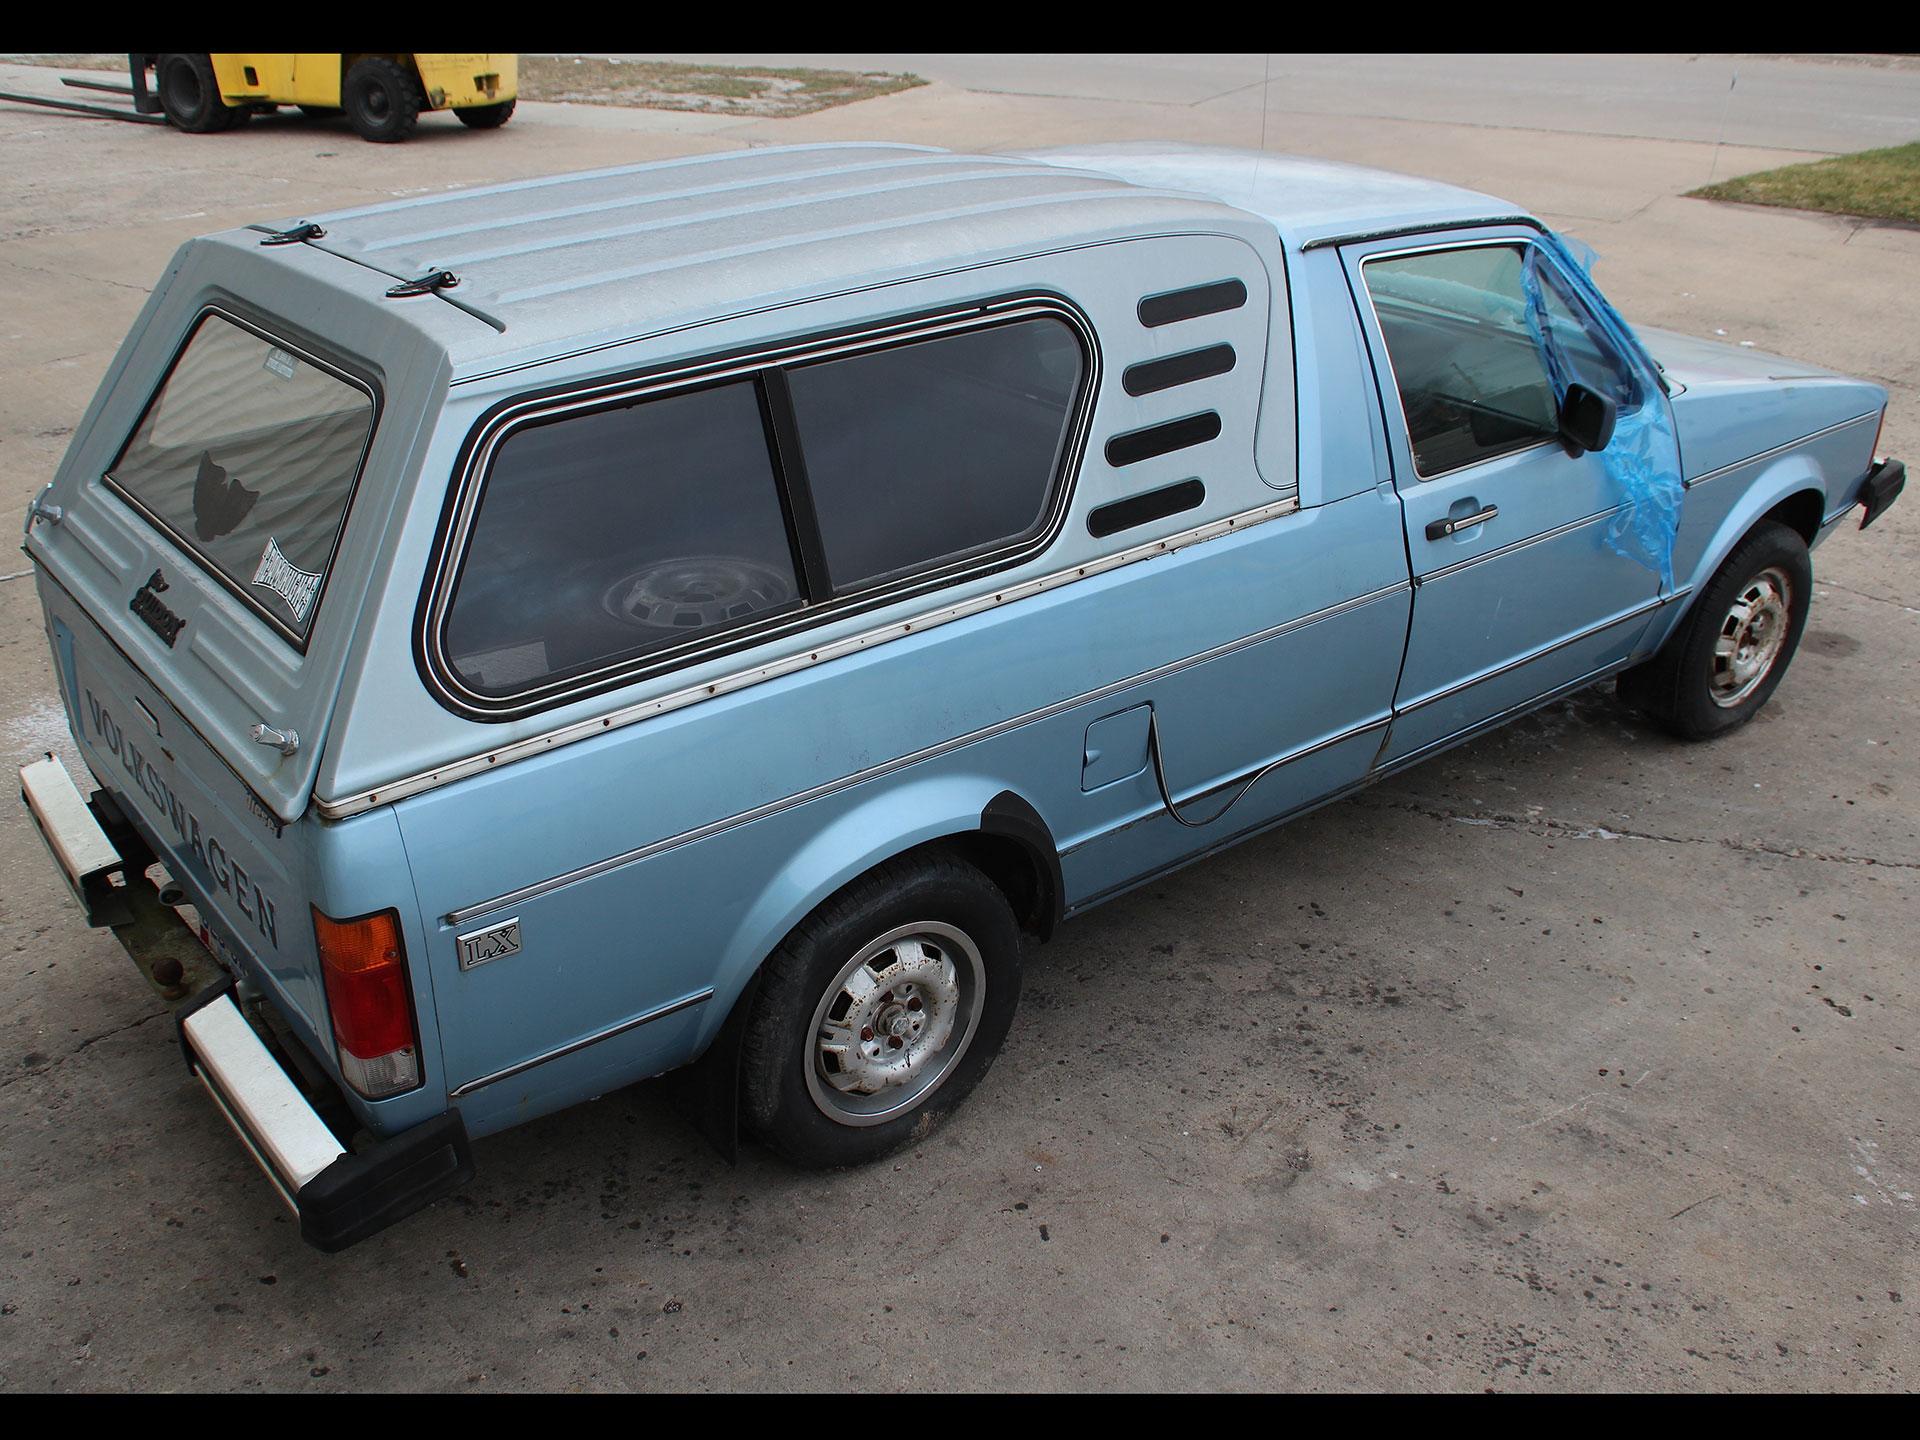 Este era el Volkswagen Rabbit pick up cuando llegó al taller de inavan. Foto: Imgur